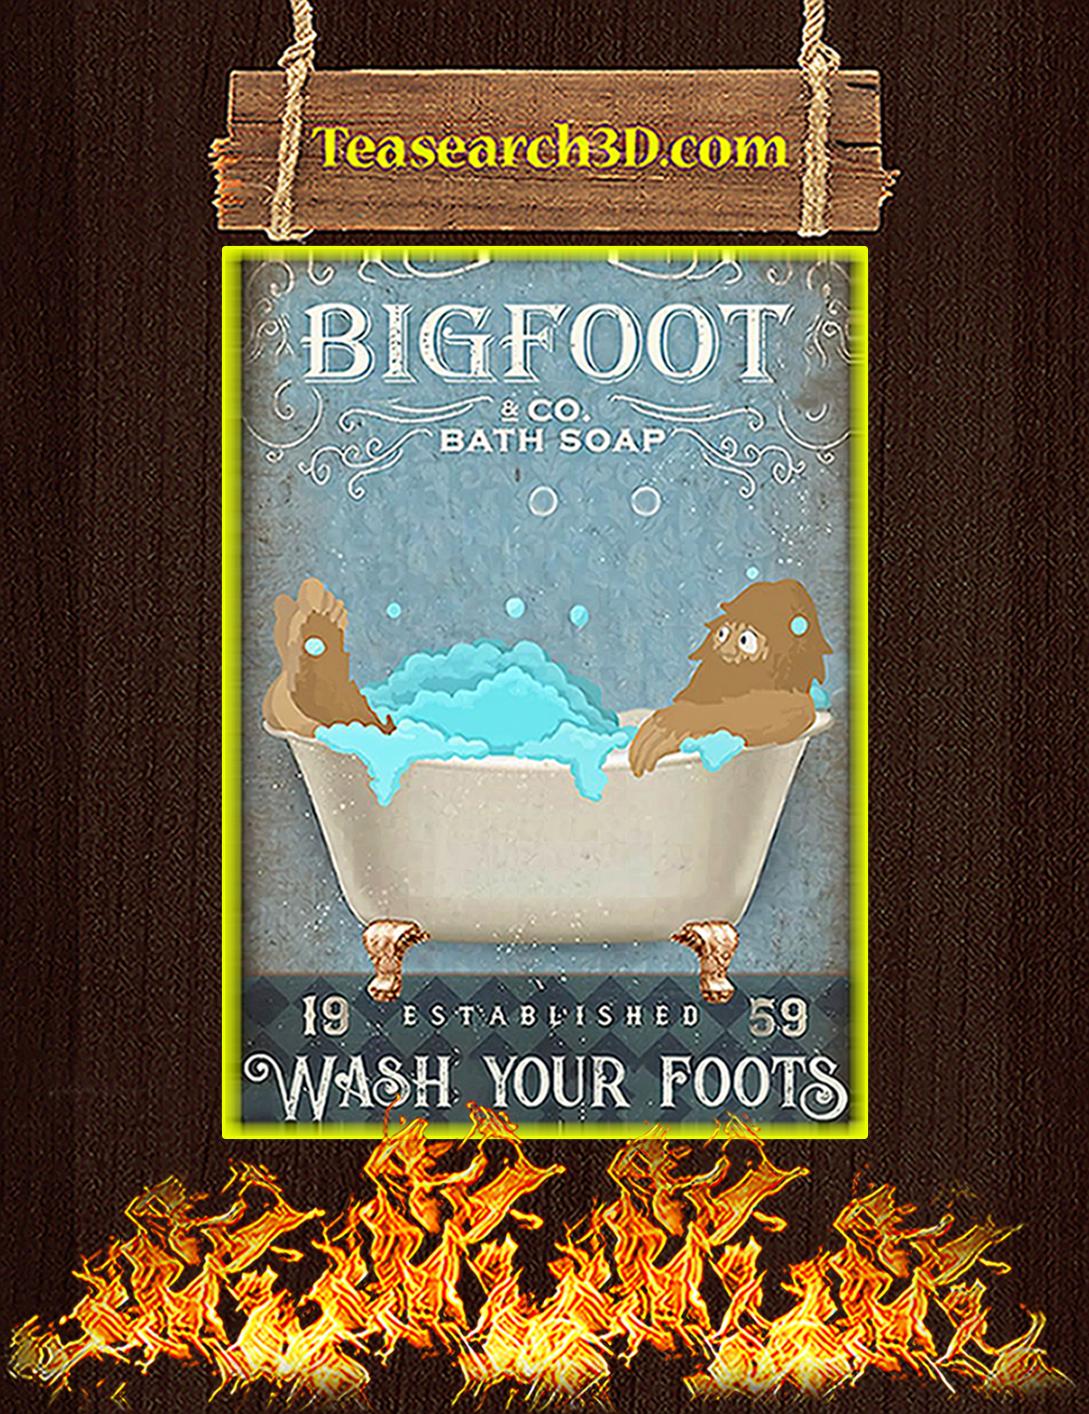 Bigfoot bath soap co wash your foots poster A2